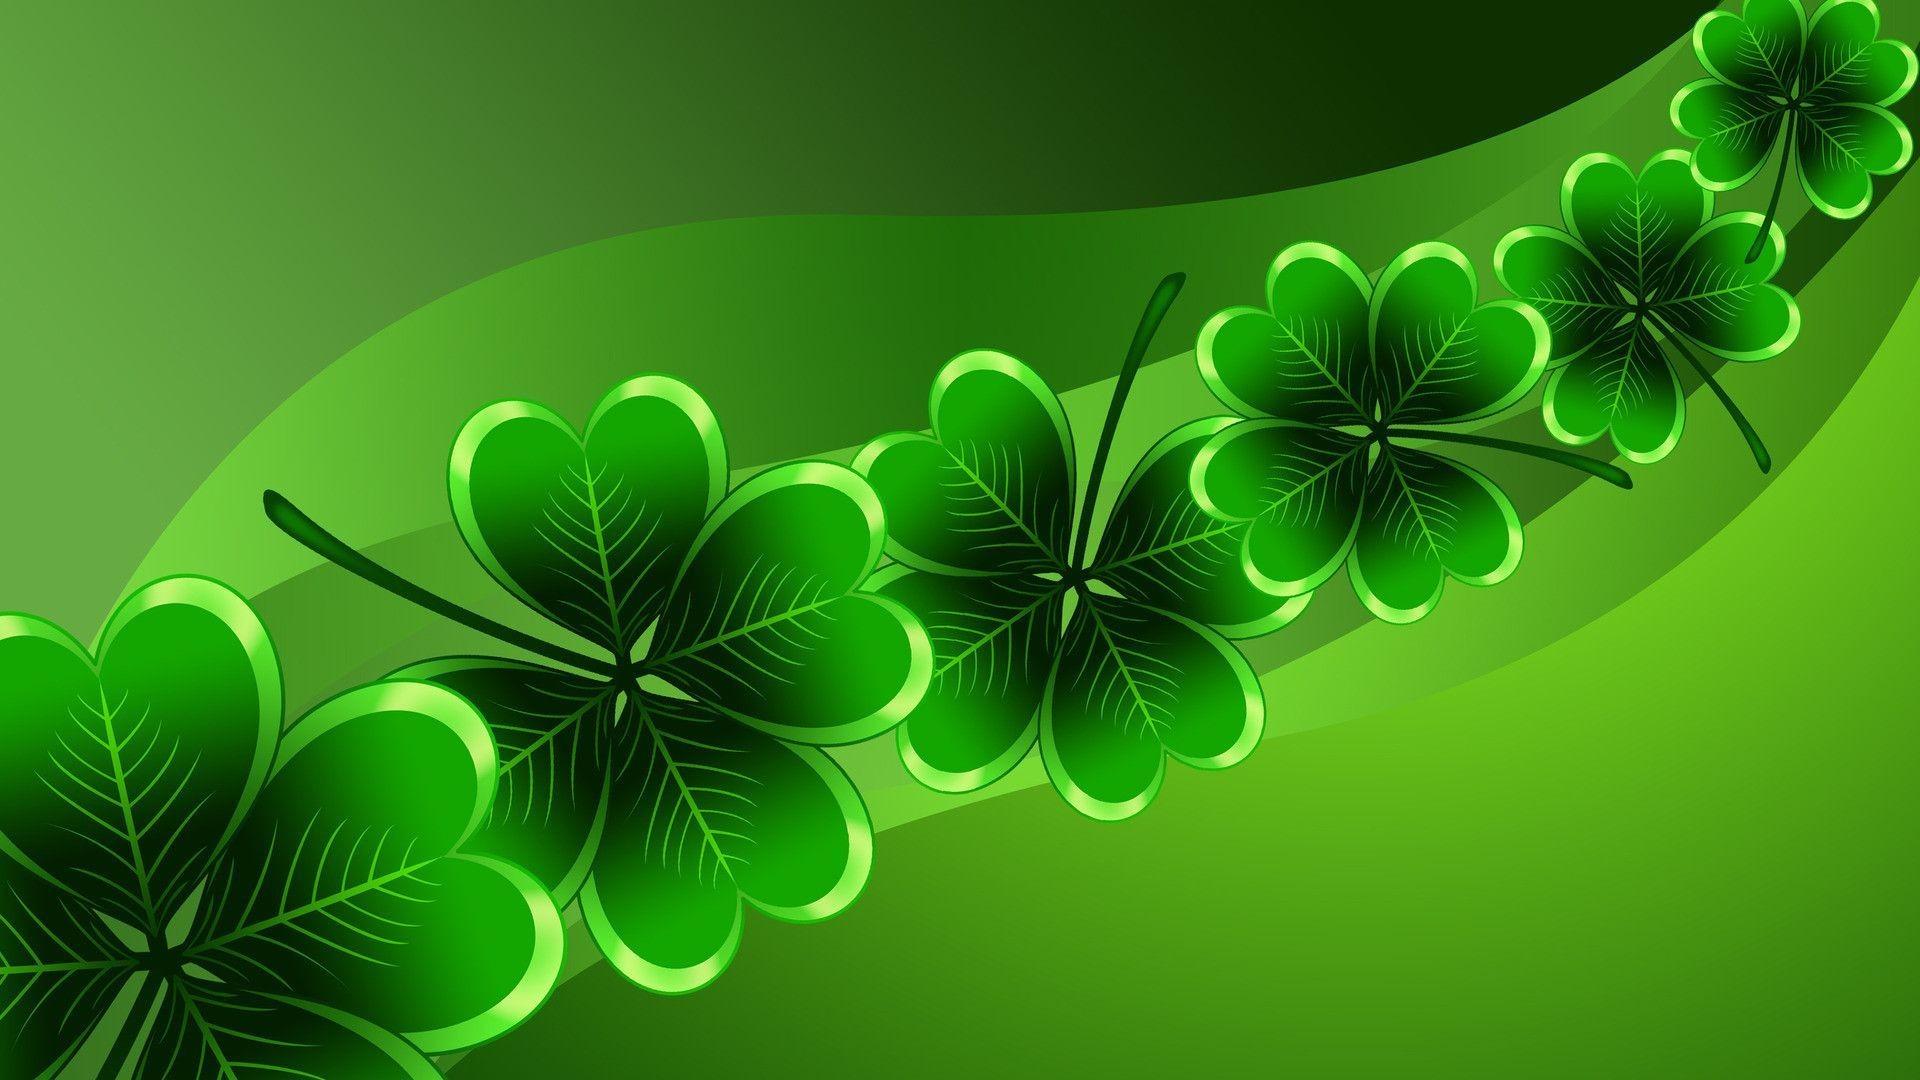 Hd St Patricks Day Wallpaper 80 Images